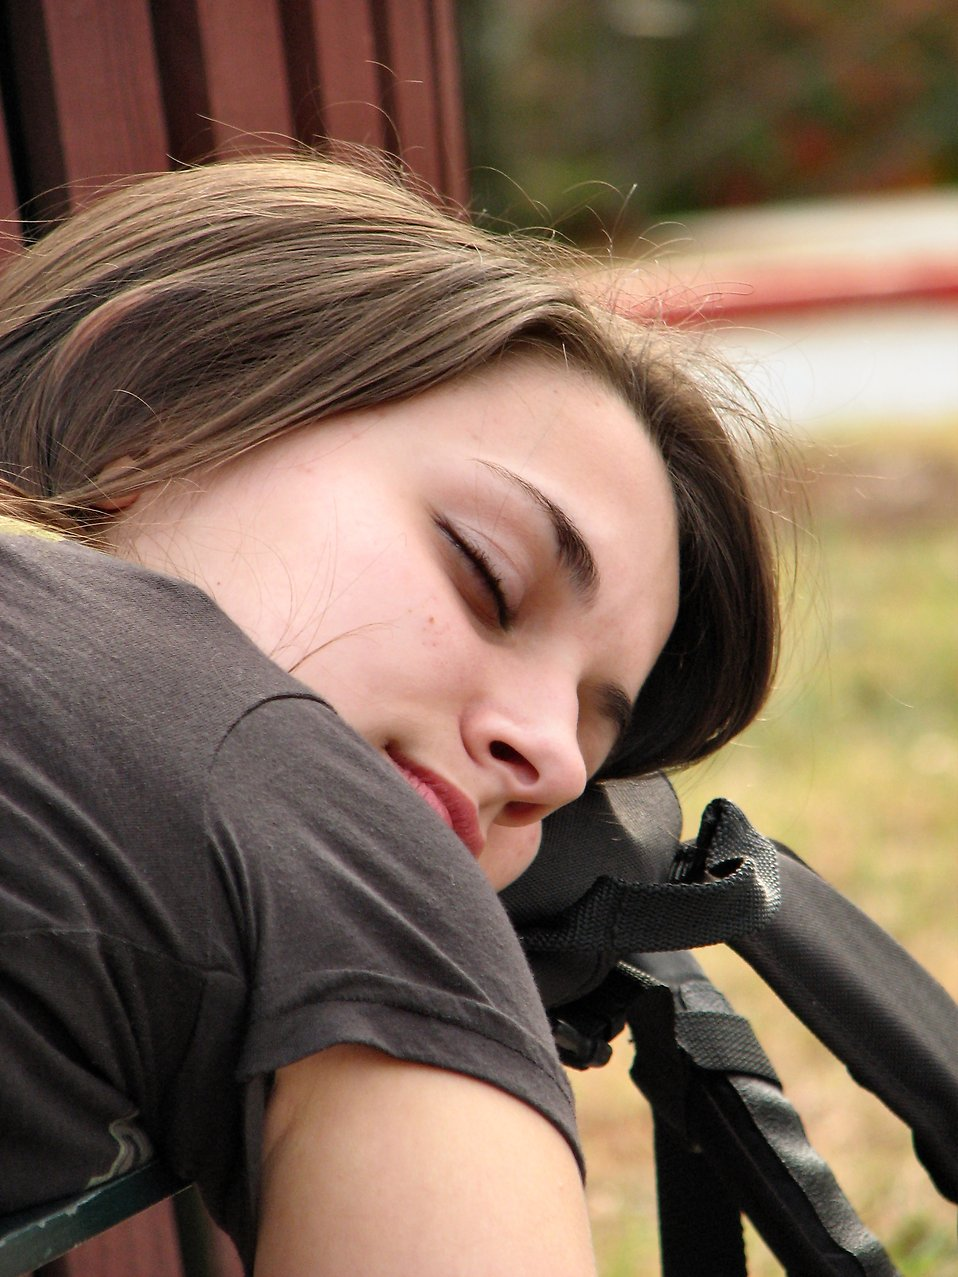 Closeup of a teen girl sleeping on a bench : Free Stock Photo